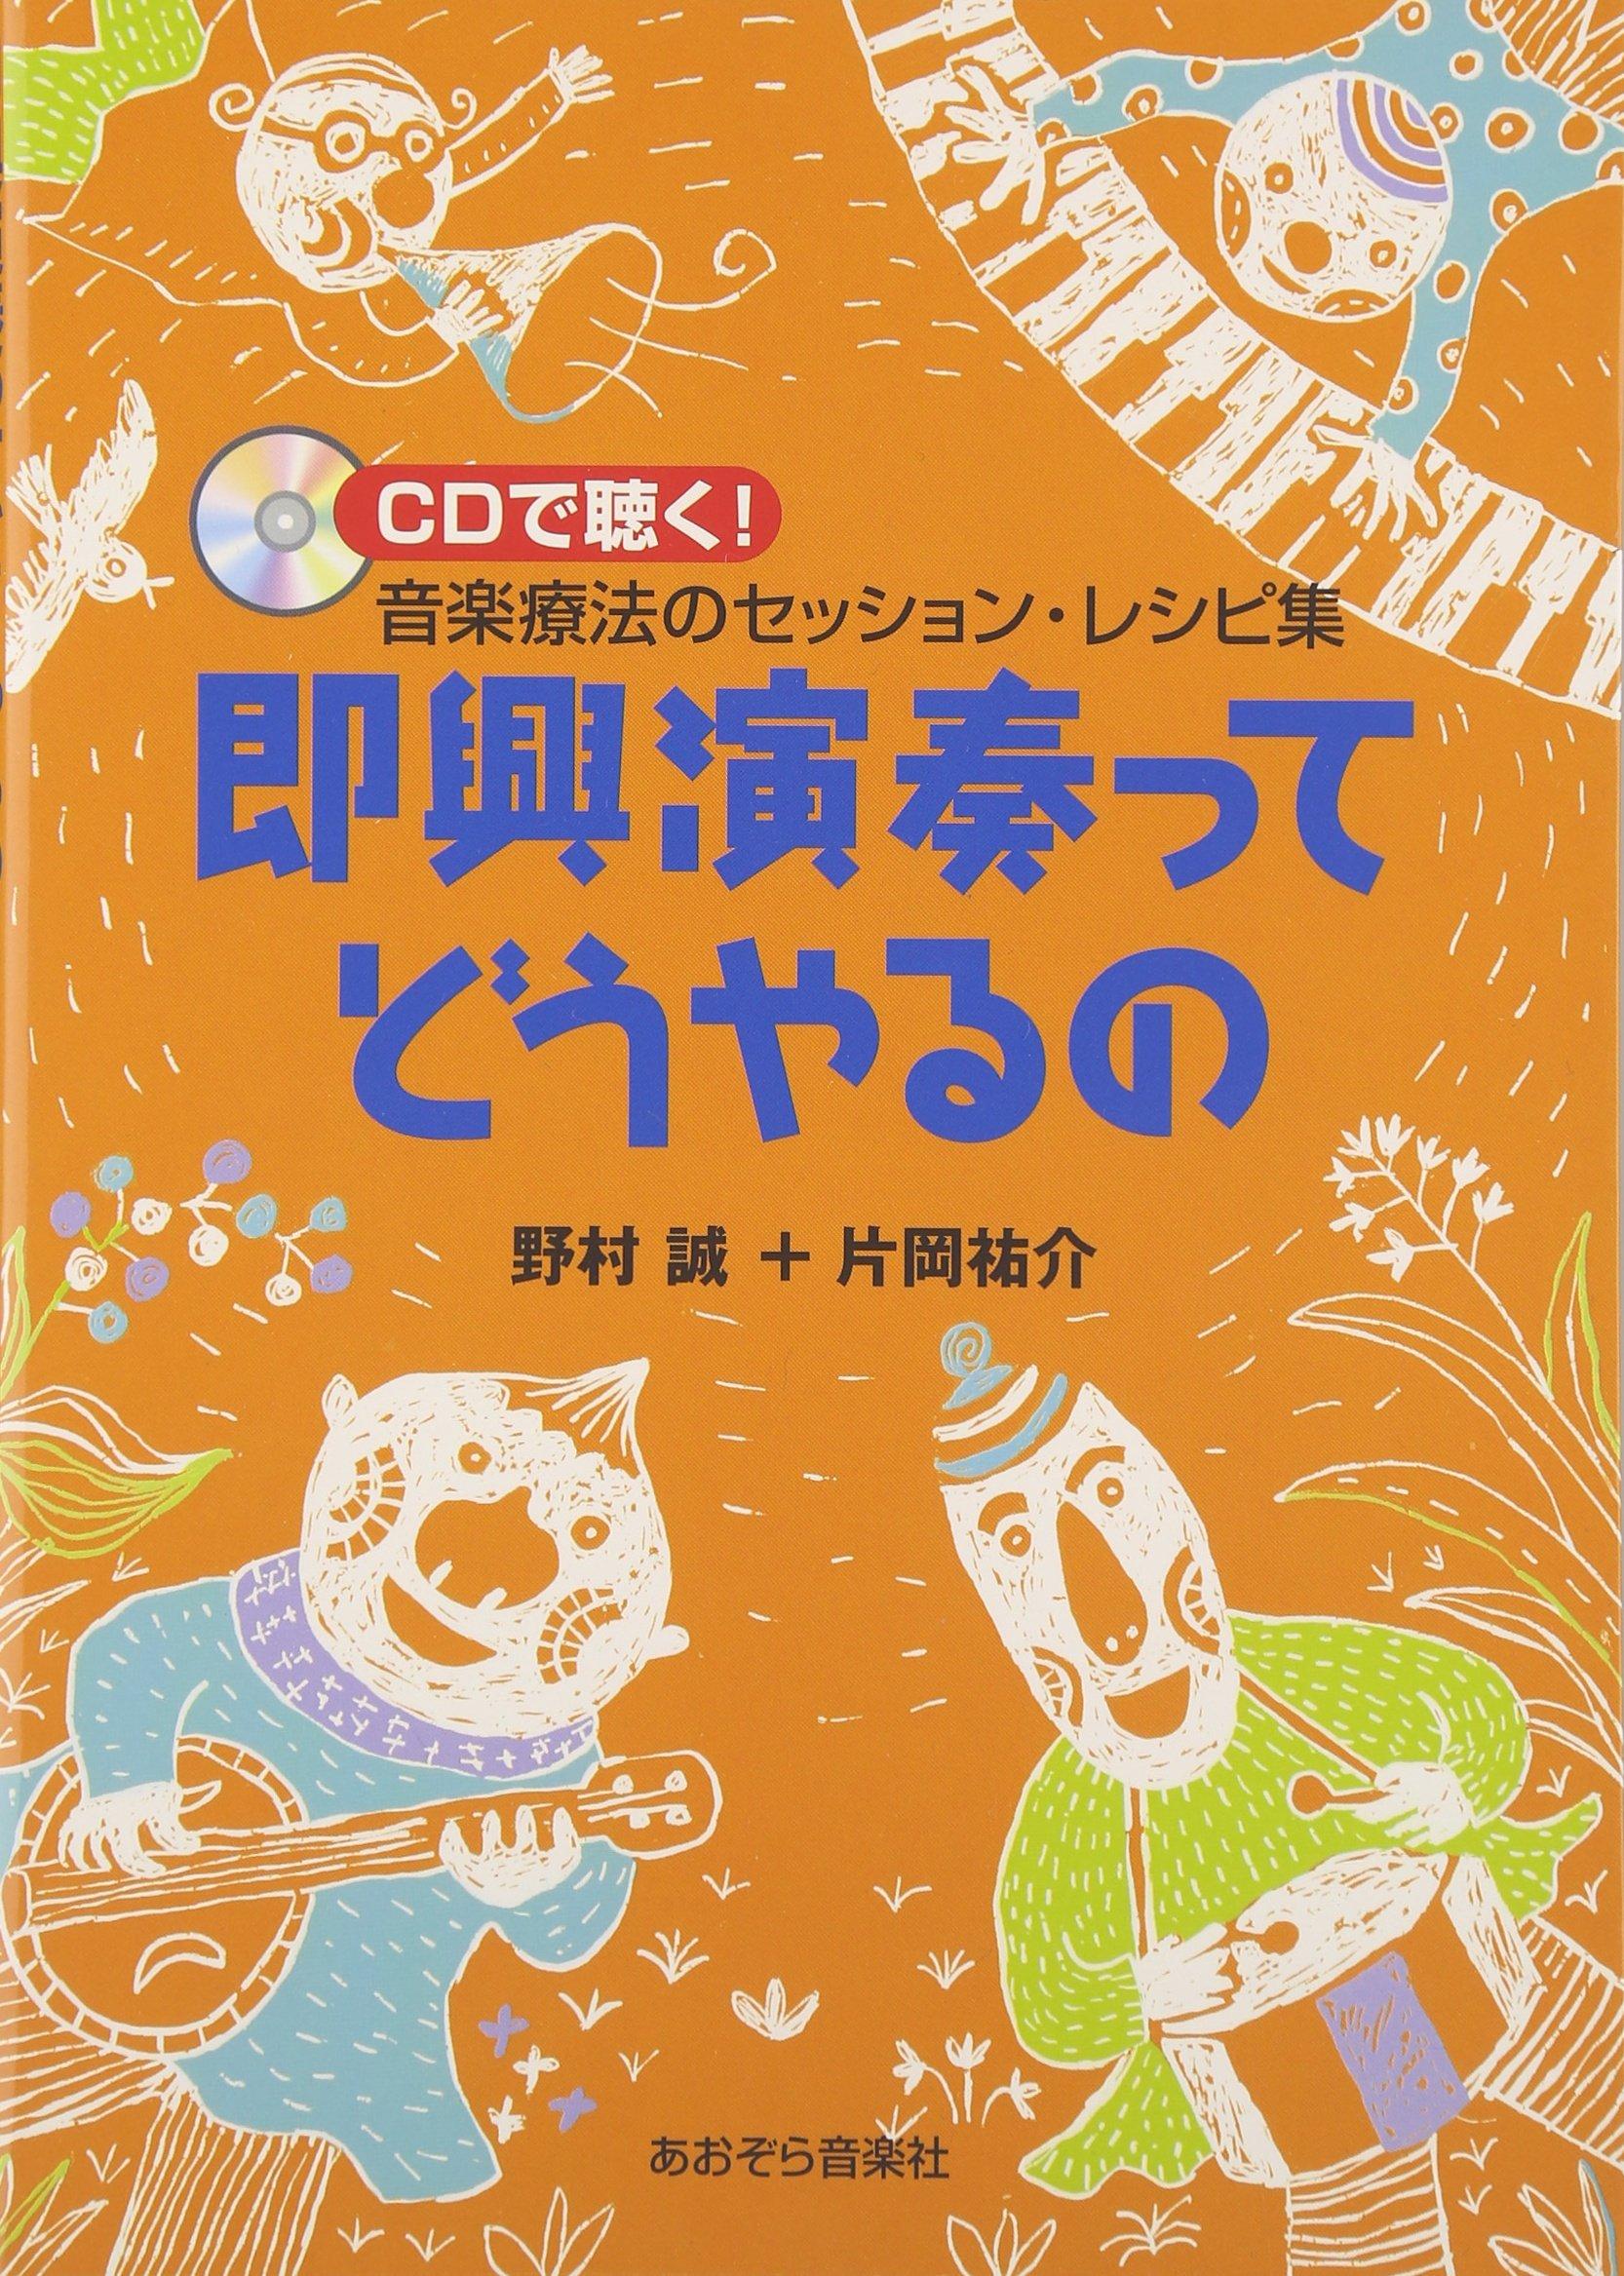 Download Sokkyō ensō tte dō yaruno : CD de kiku ongaku ryōhō no sesshon reshipishū ebook